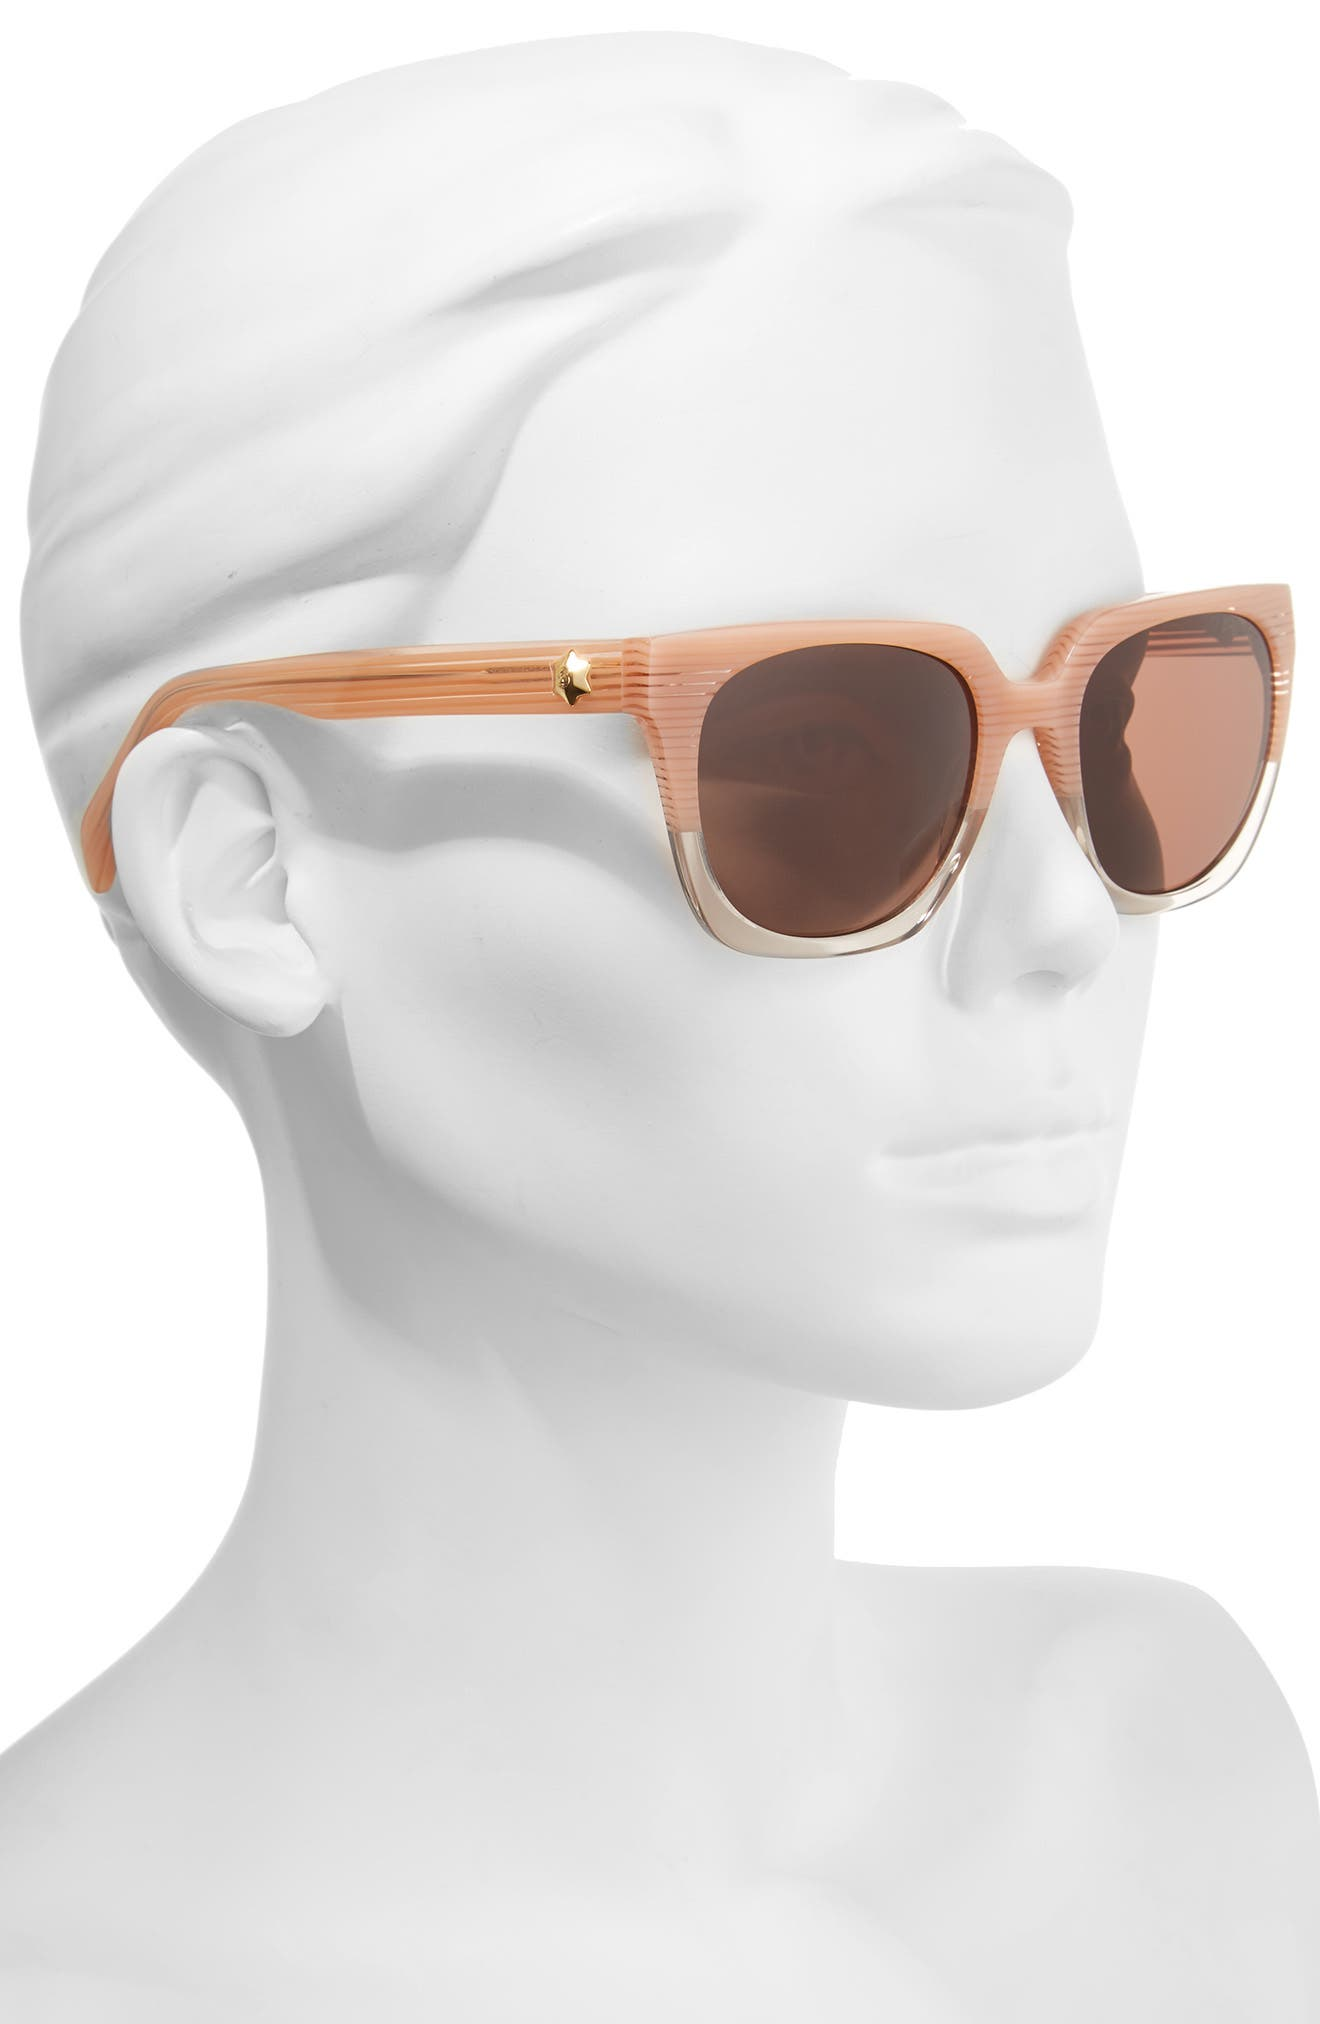 54mm Square Sunglasses,                             Alternate thumbnail 2, color,                             Pink